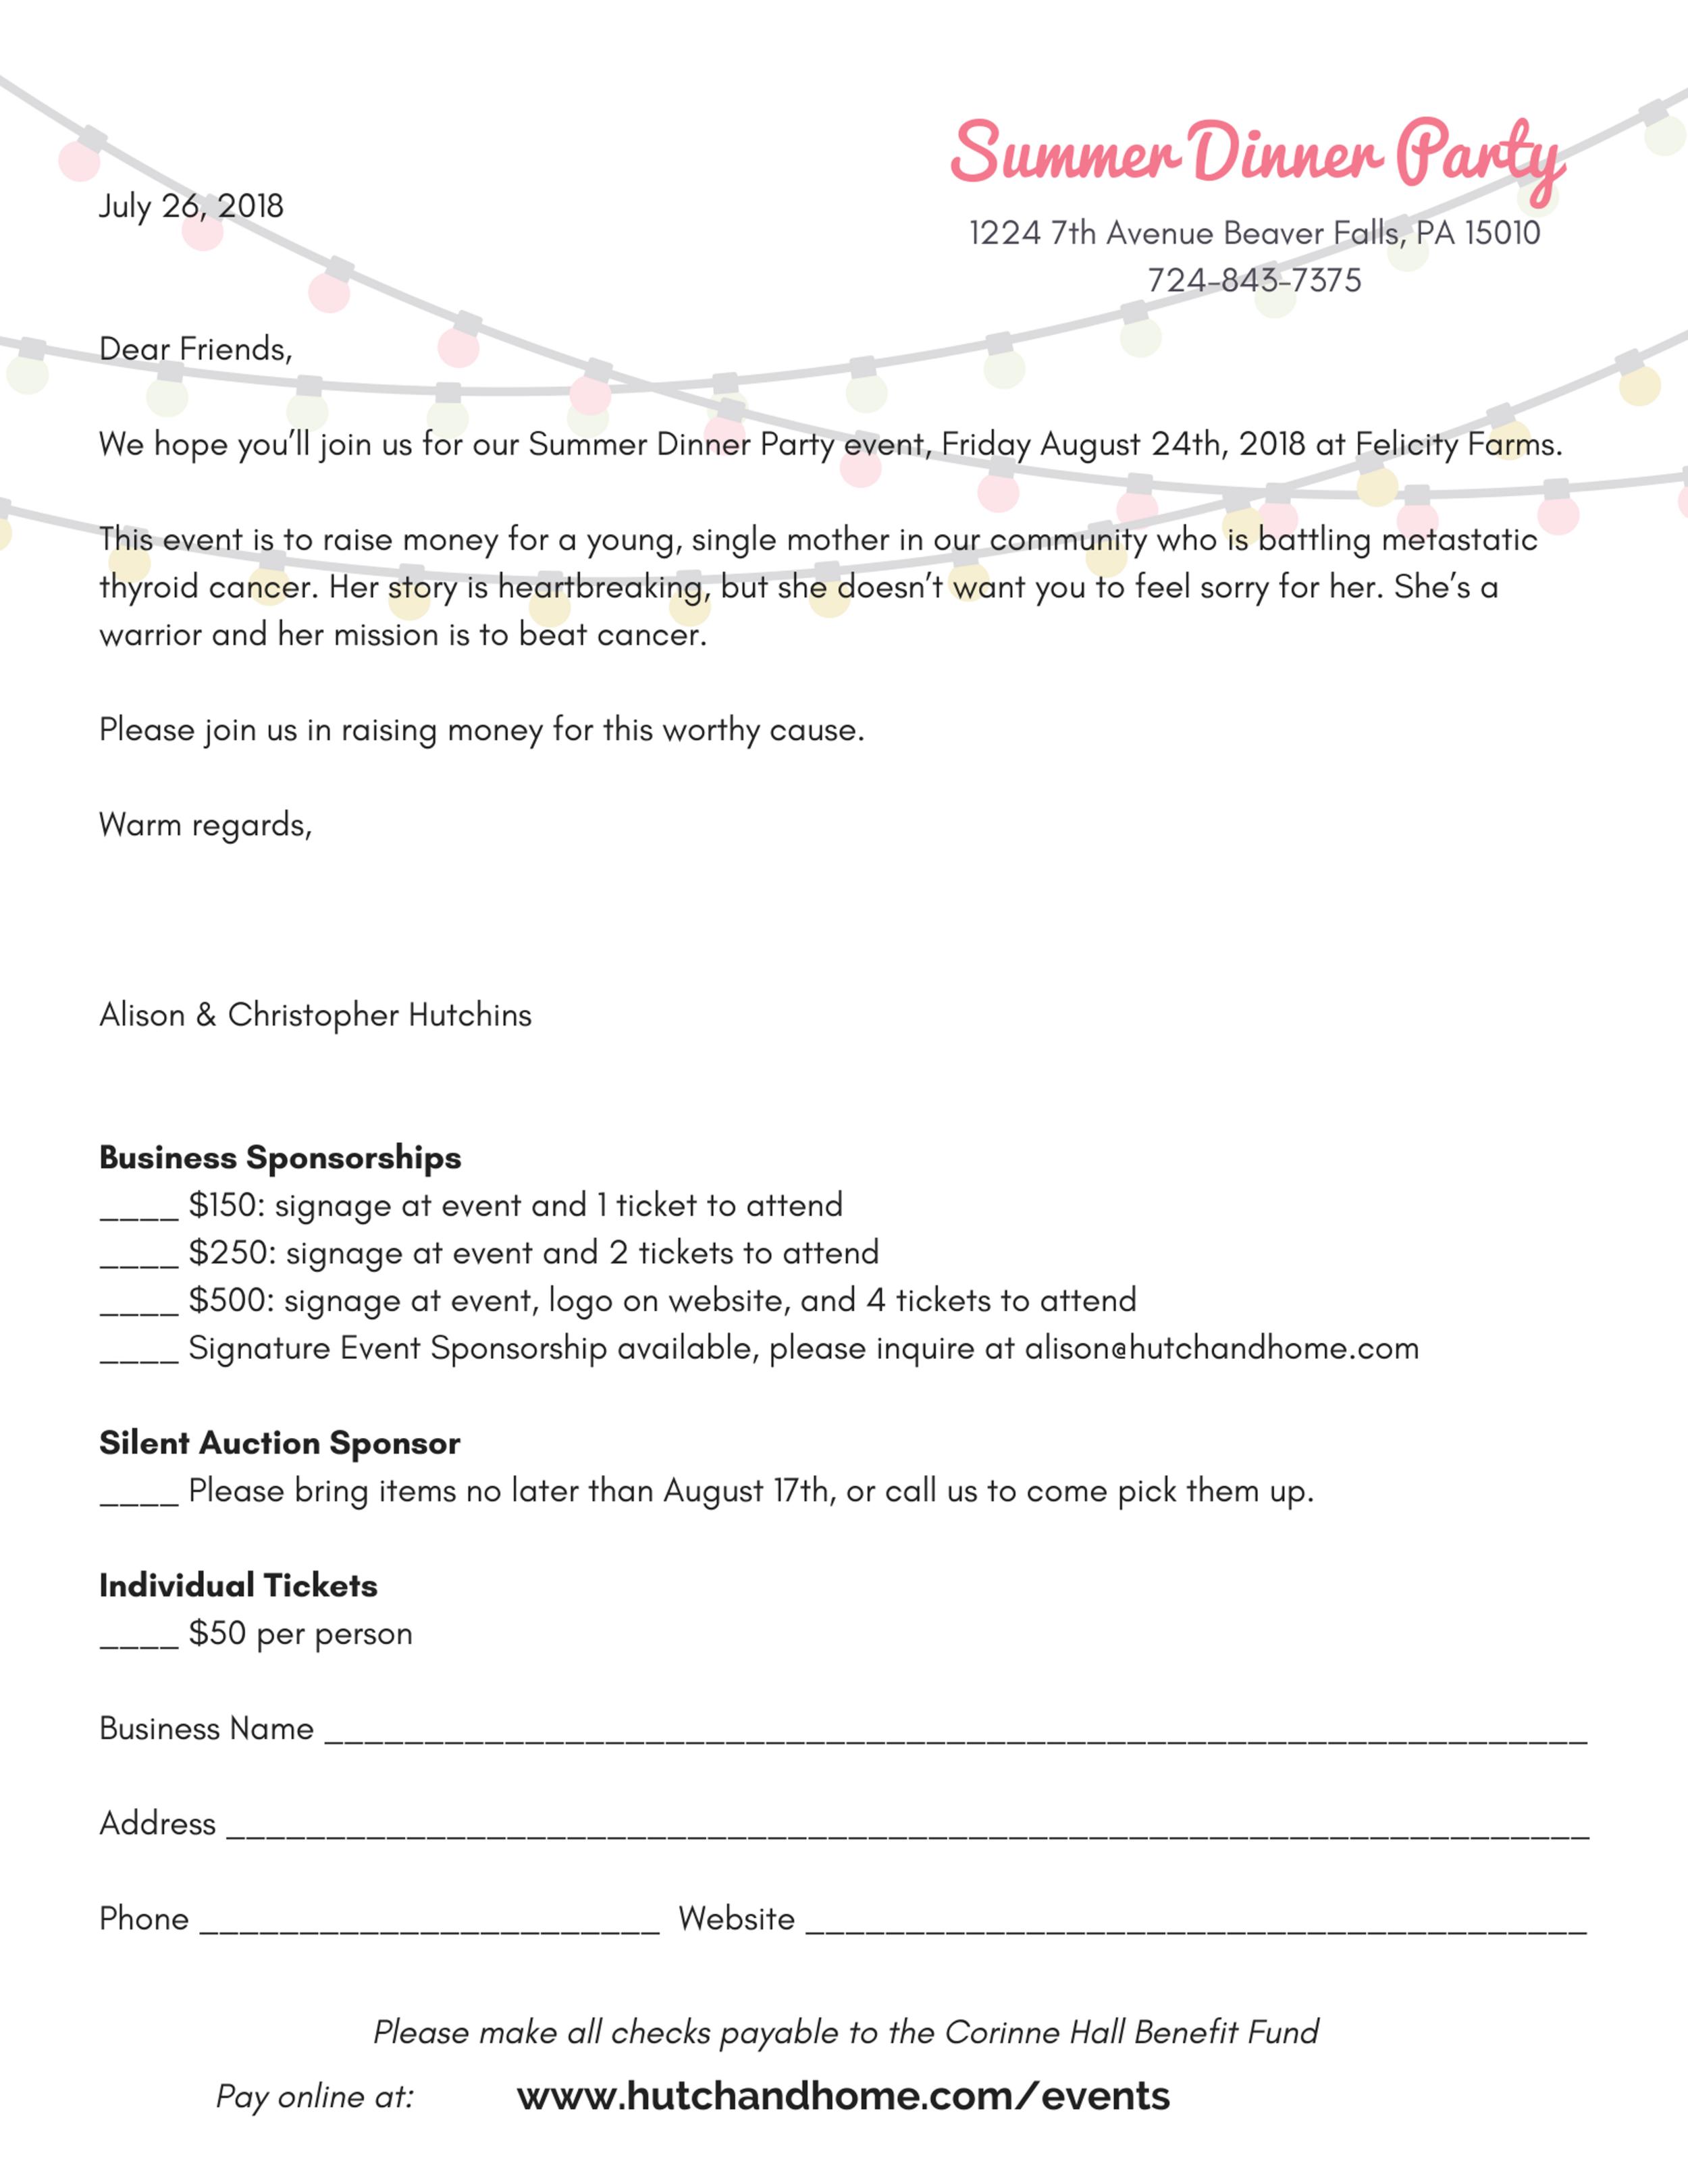 Summer Dinner Party Felicity Farms 2018 Sponsorship letter.png